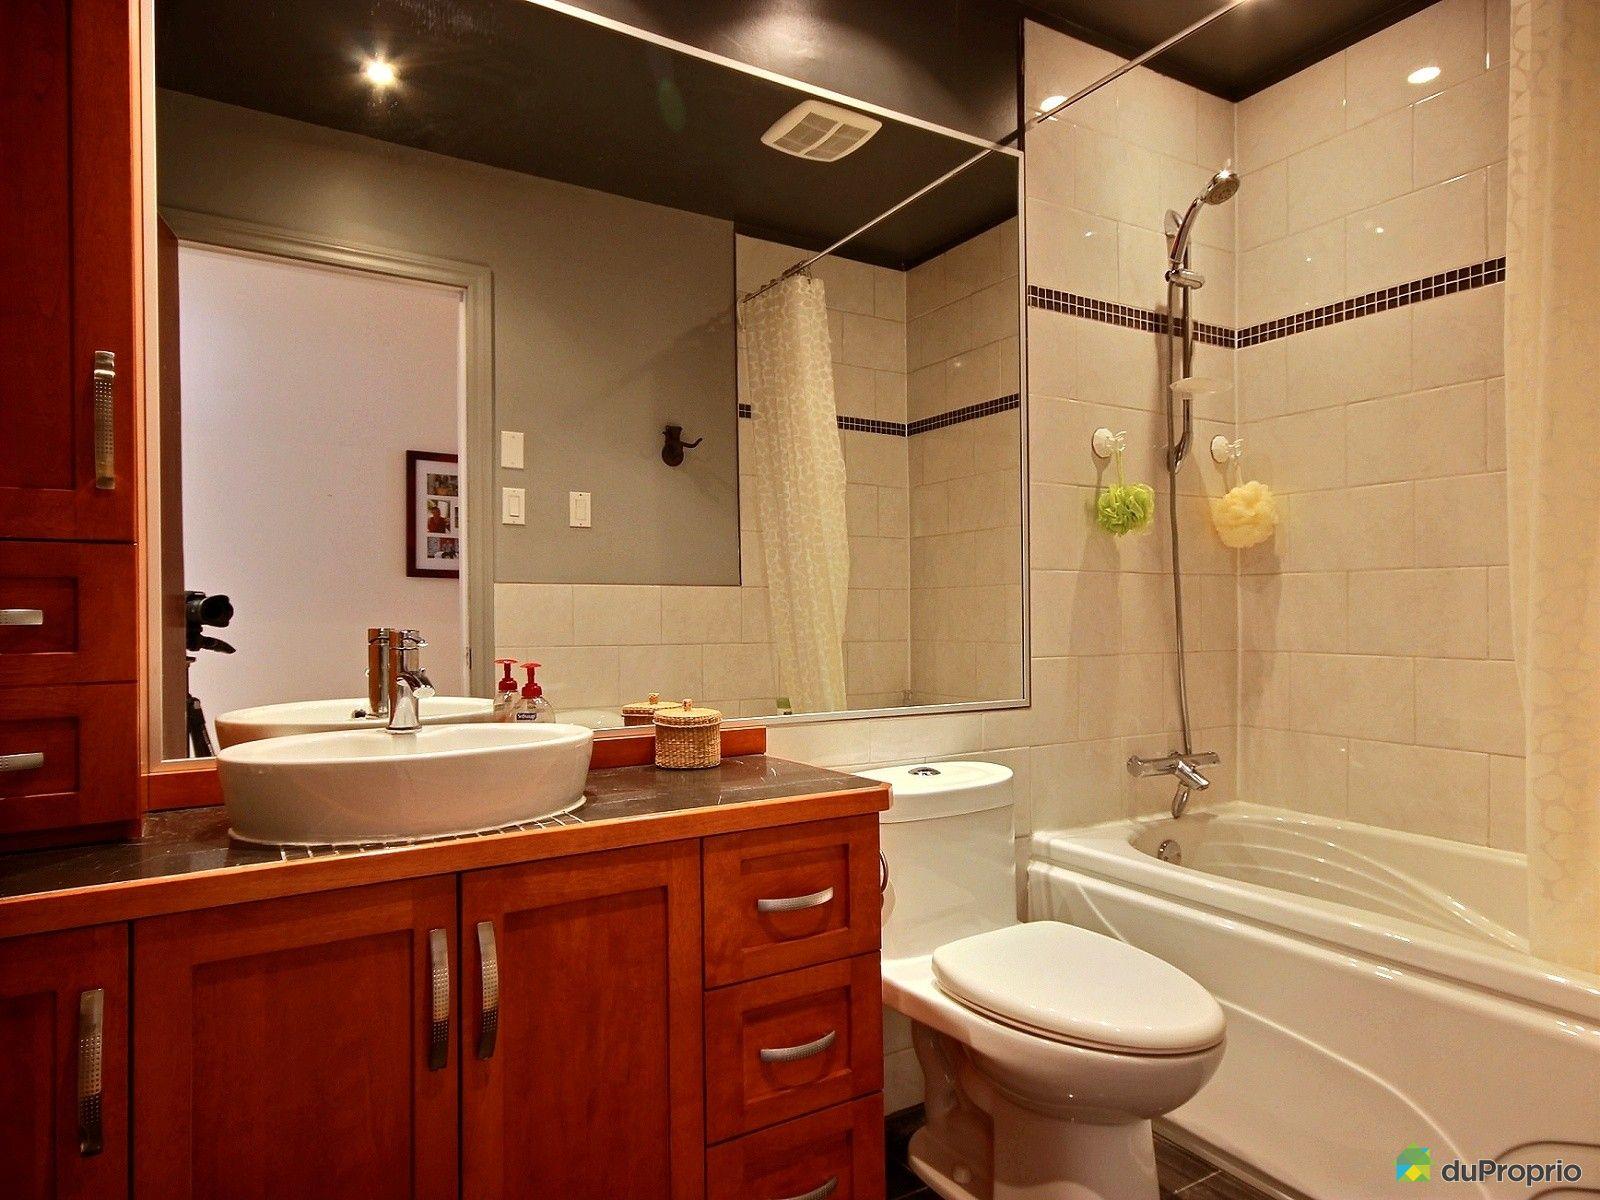 maison vendu ulverton immobilier qu bec duproprio 503488. Black Bedroom Furniture Sets. Home Design Ideas